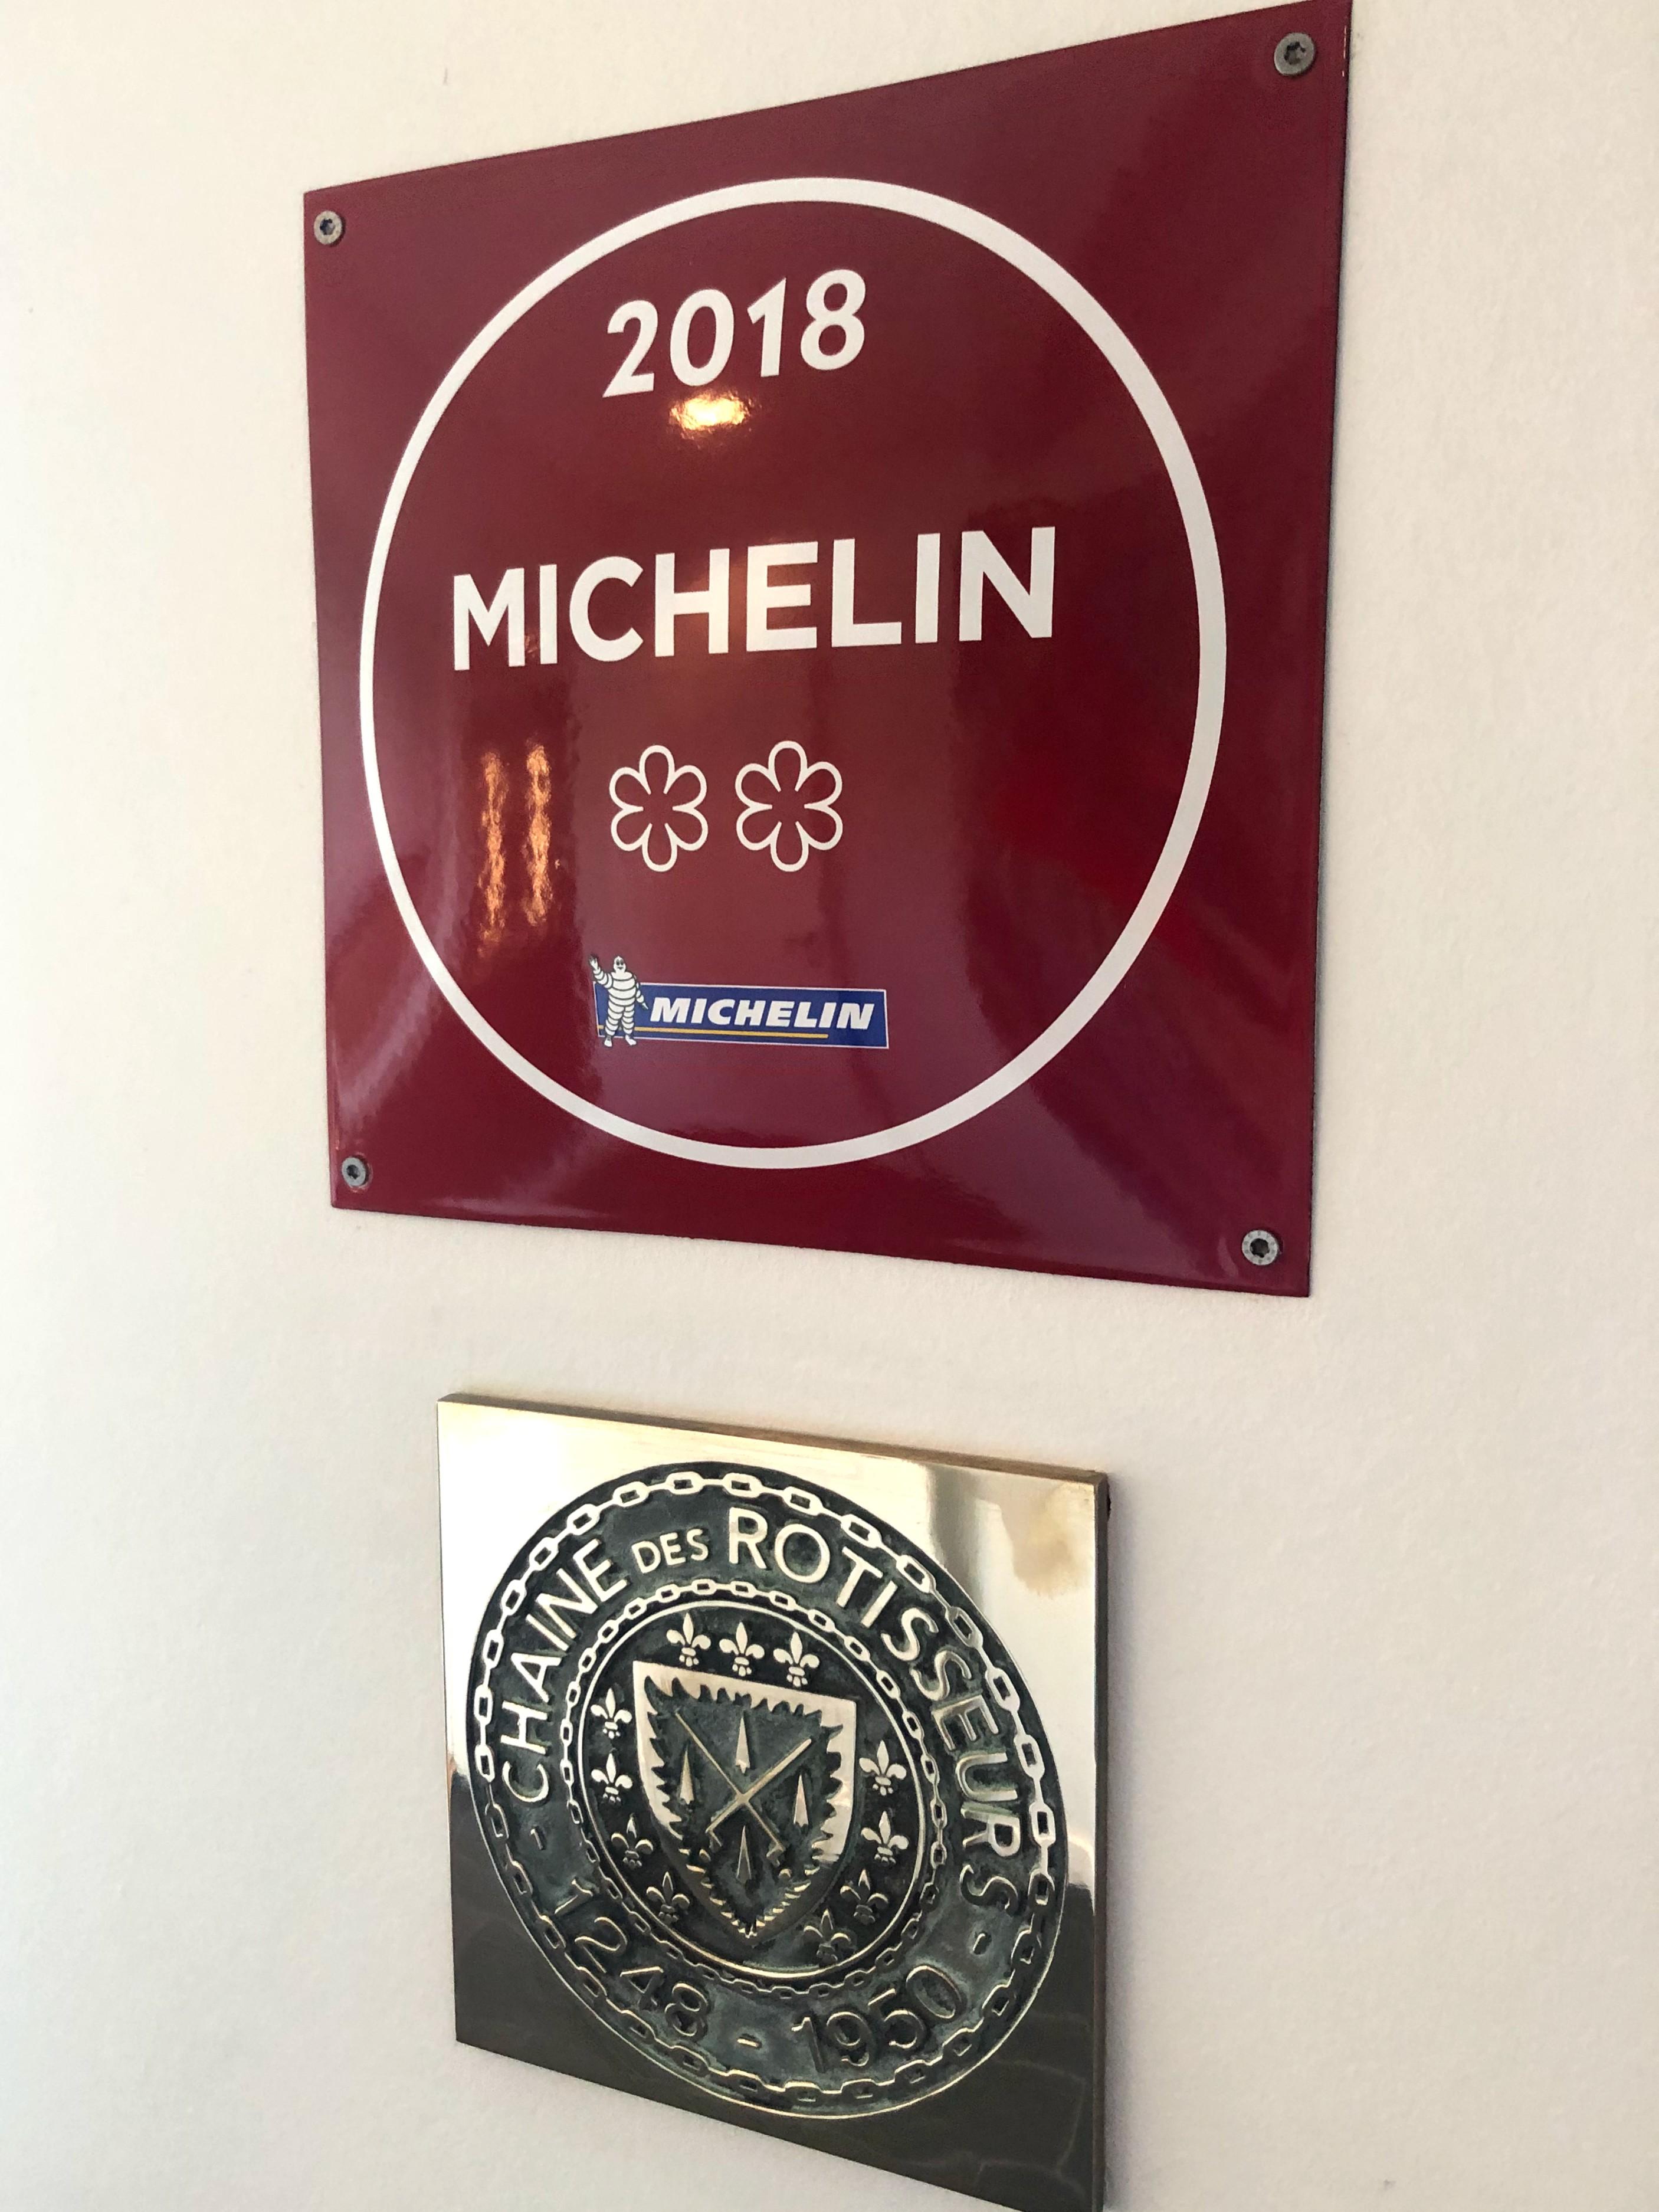 Two Michelin stars